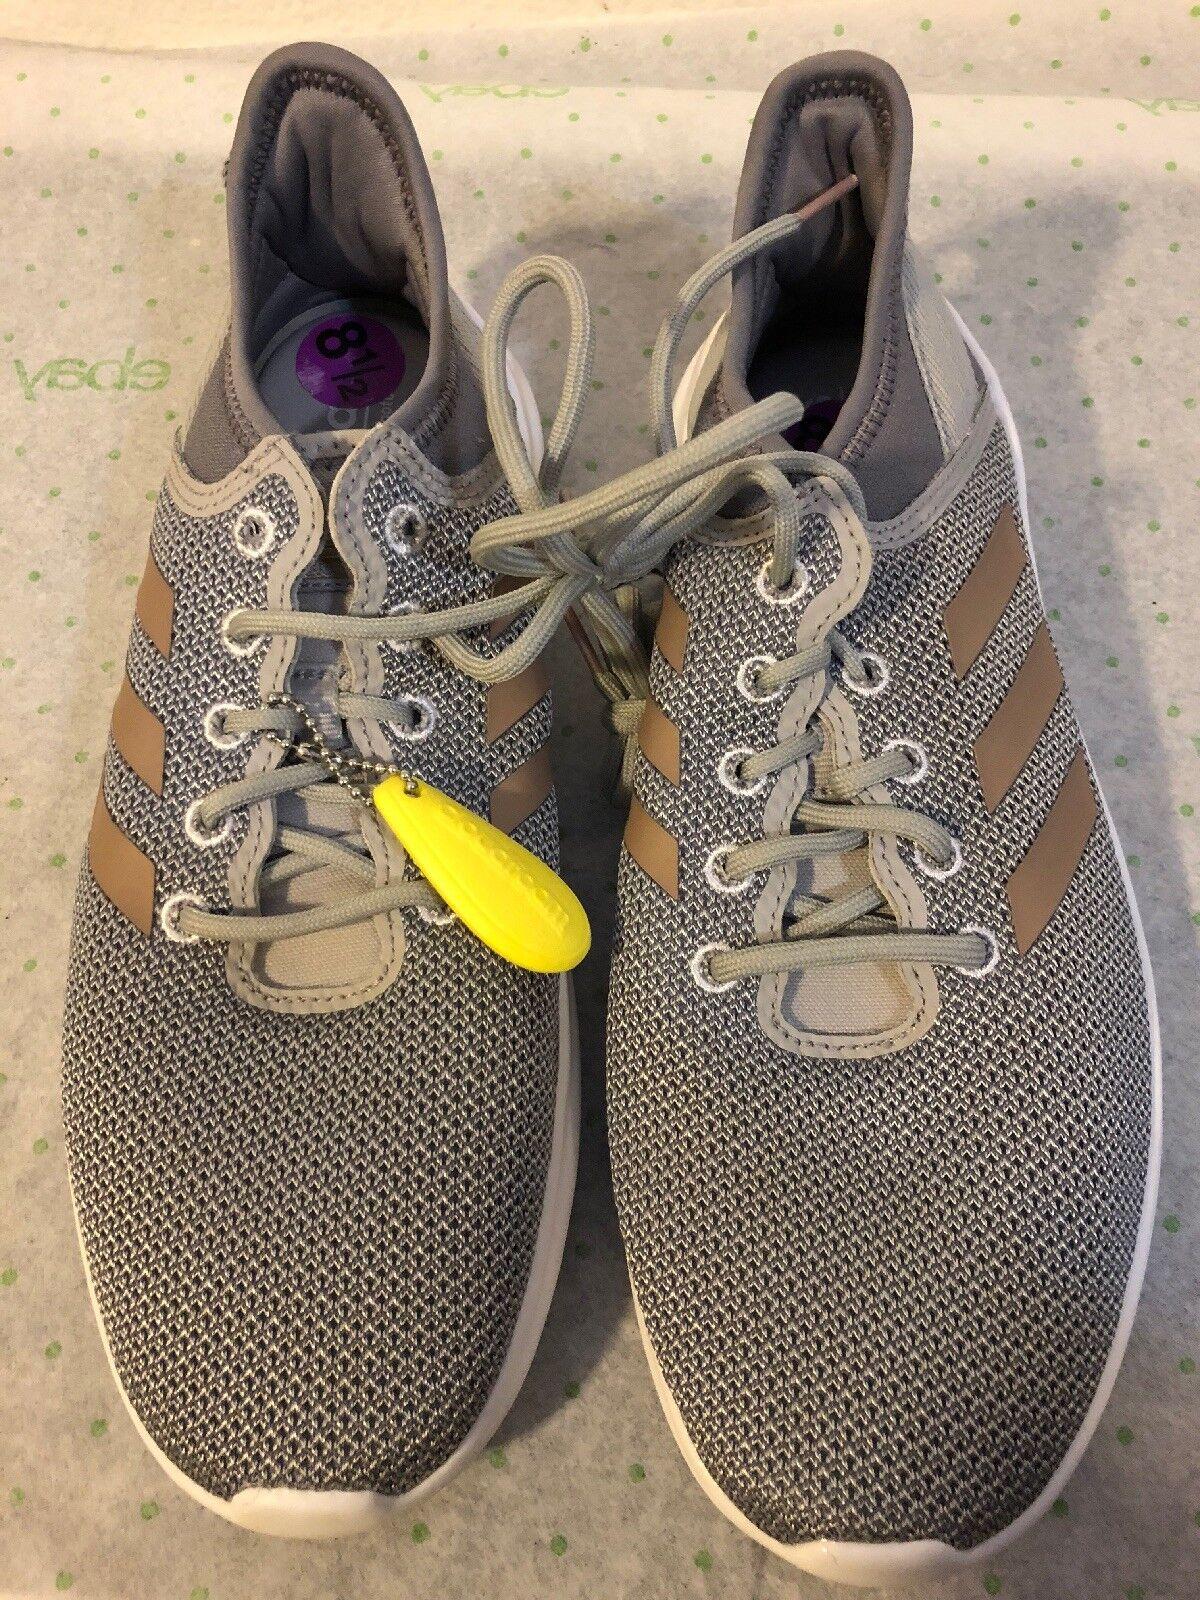 Women's Adidas CF Qtflex DA9835 Grey gold shoes Size 8.5